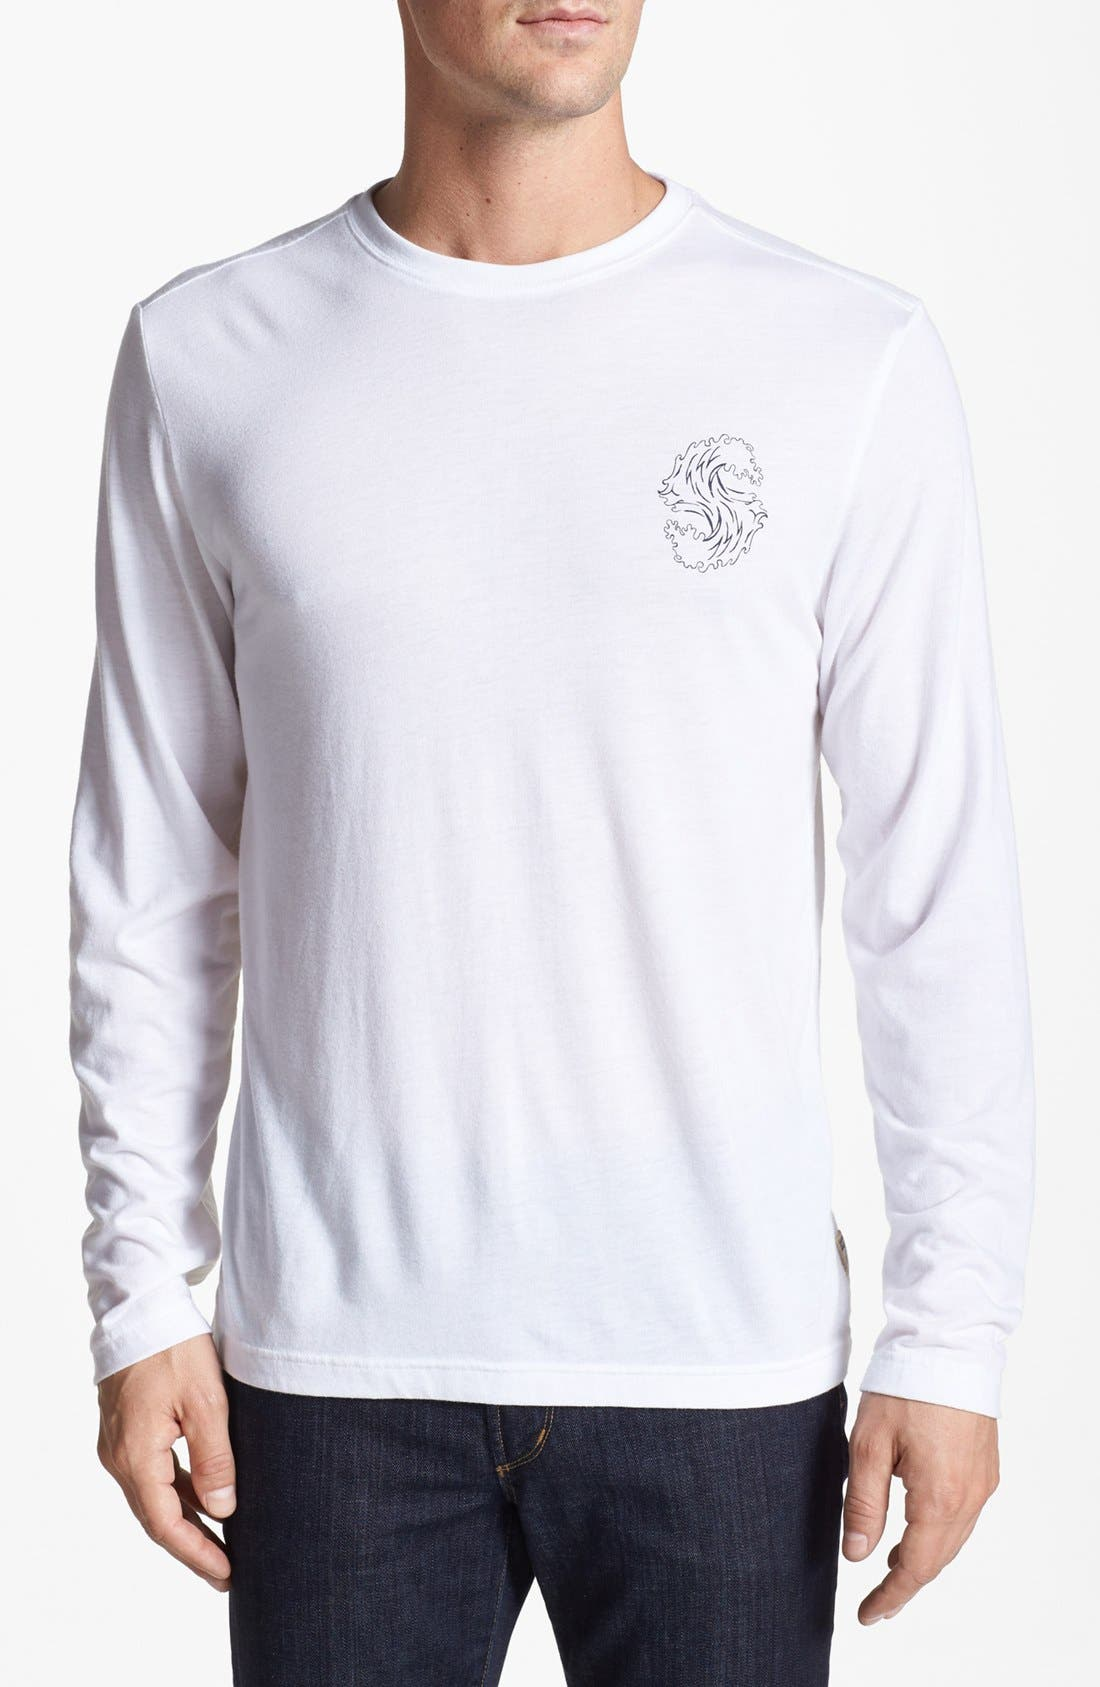 Main Image - Surfside Supply 'Tony' Long Sleeve T-Shirt